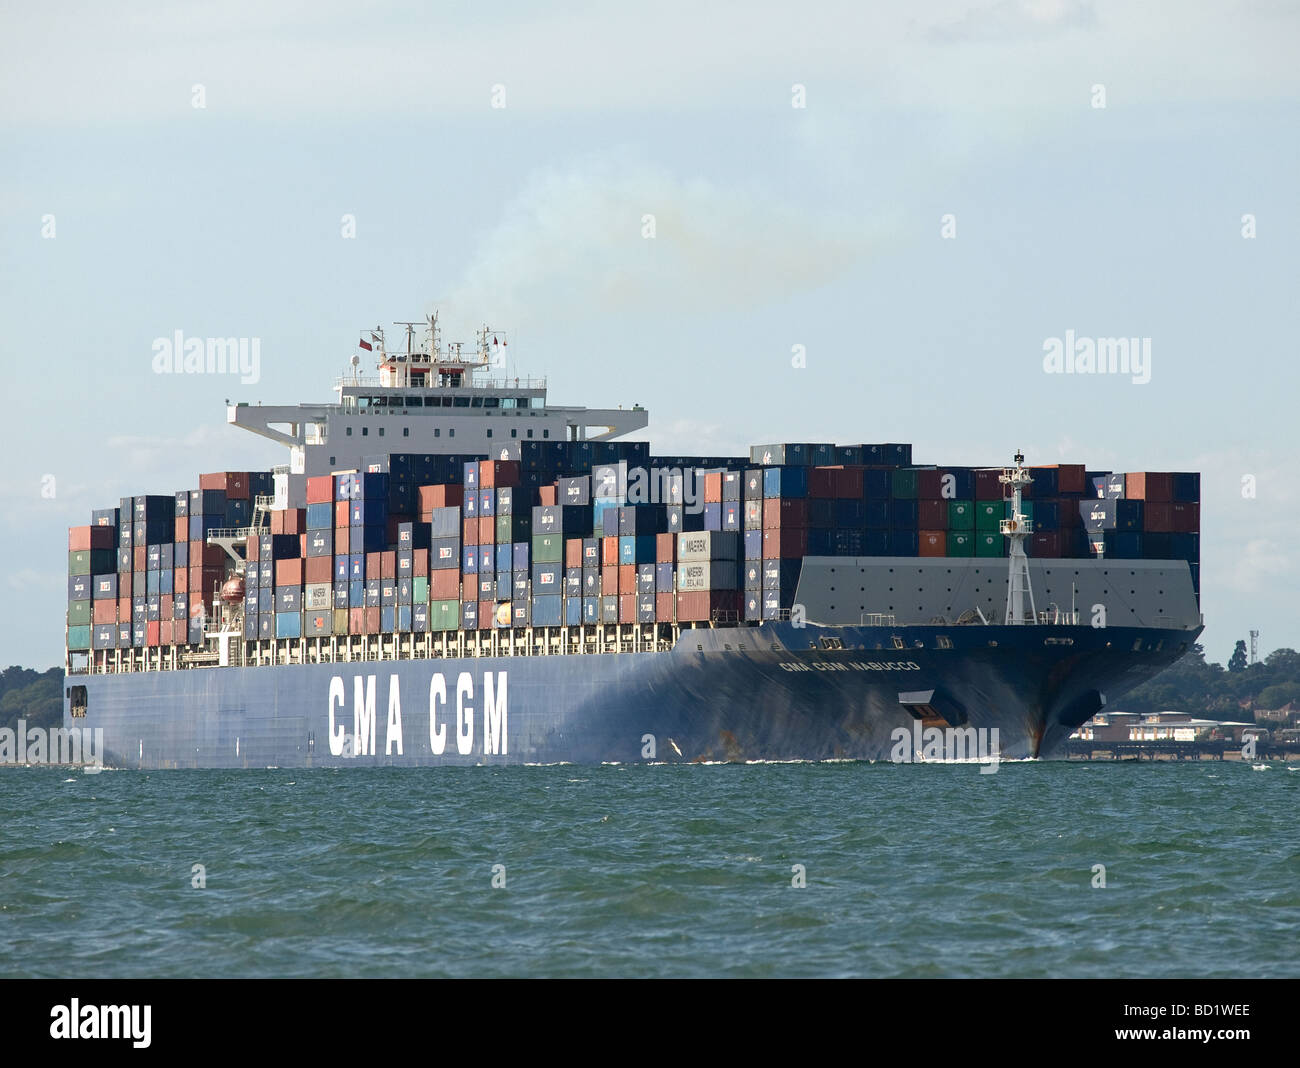 Container ship CMA CGM Nabucco leaving Southampton UK - Stock Image